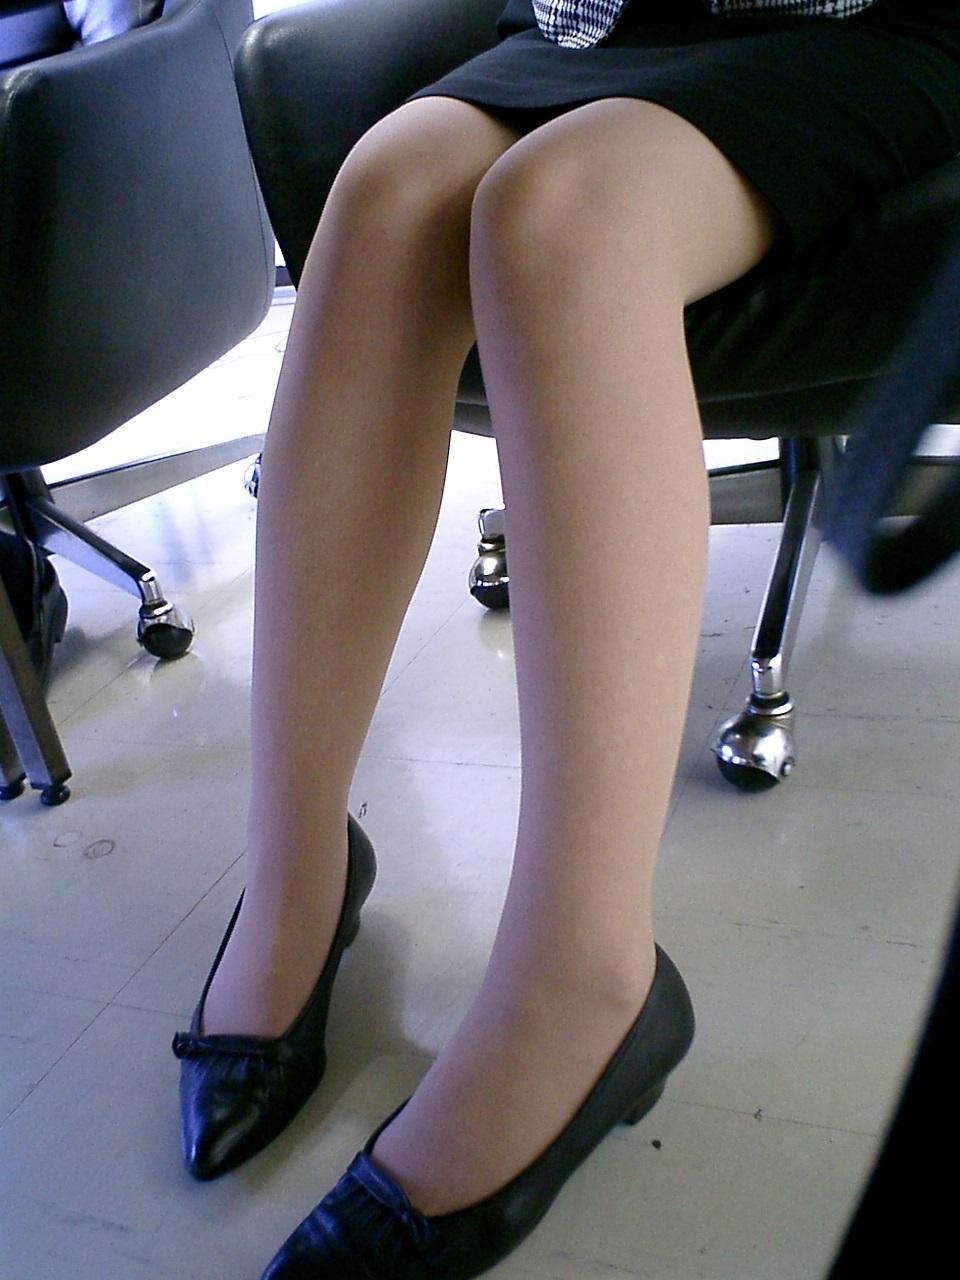 【OLパンチラ画像】仕事中の下半身は締まりがないwwwOLの股間を机の下から覗き撮り 13